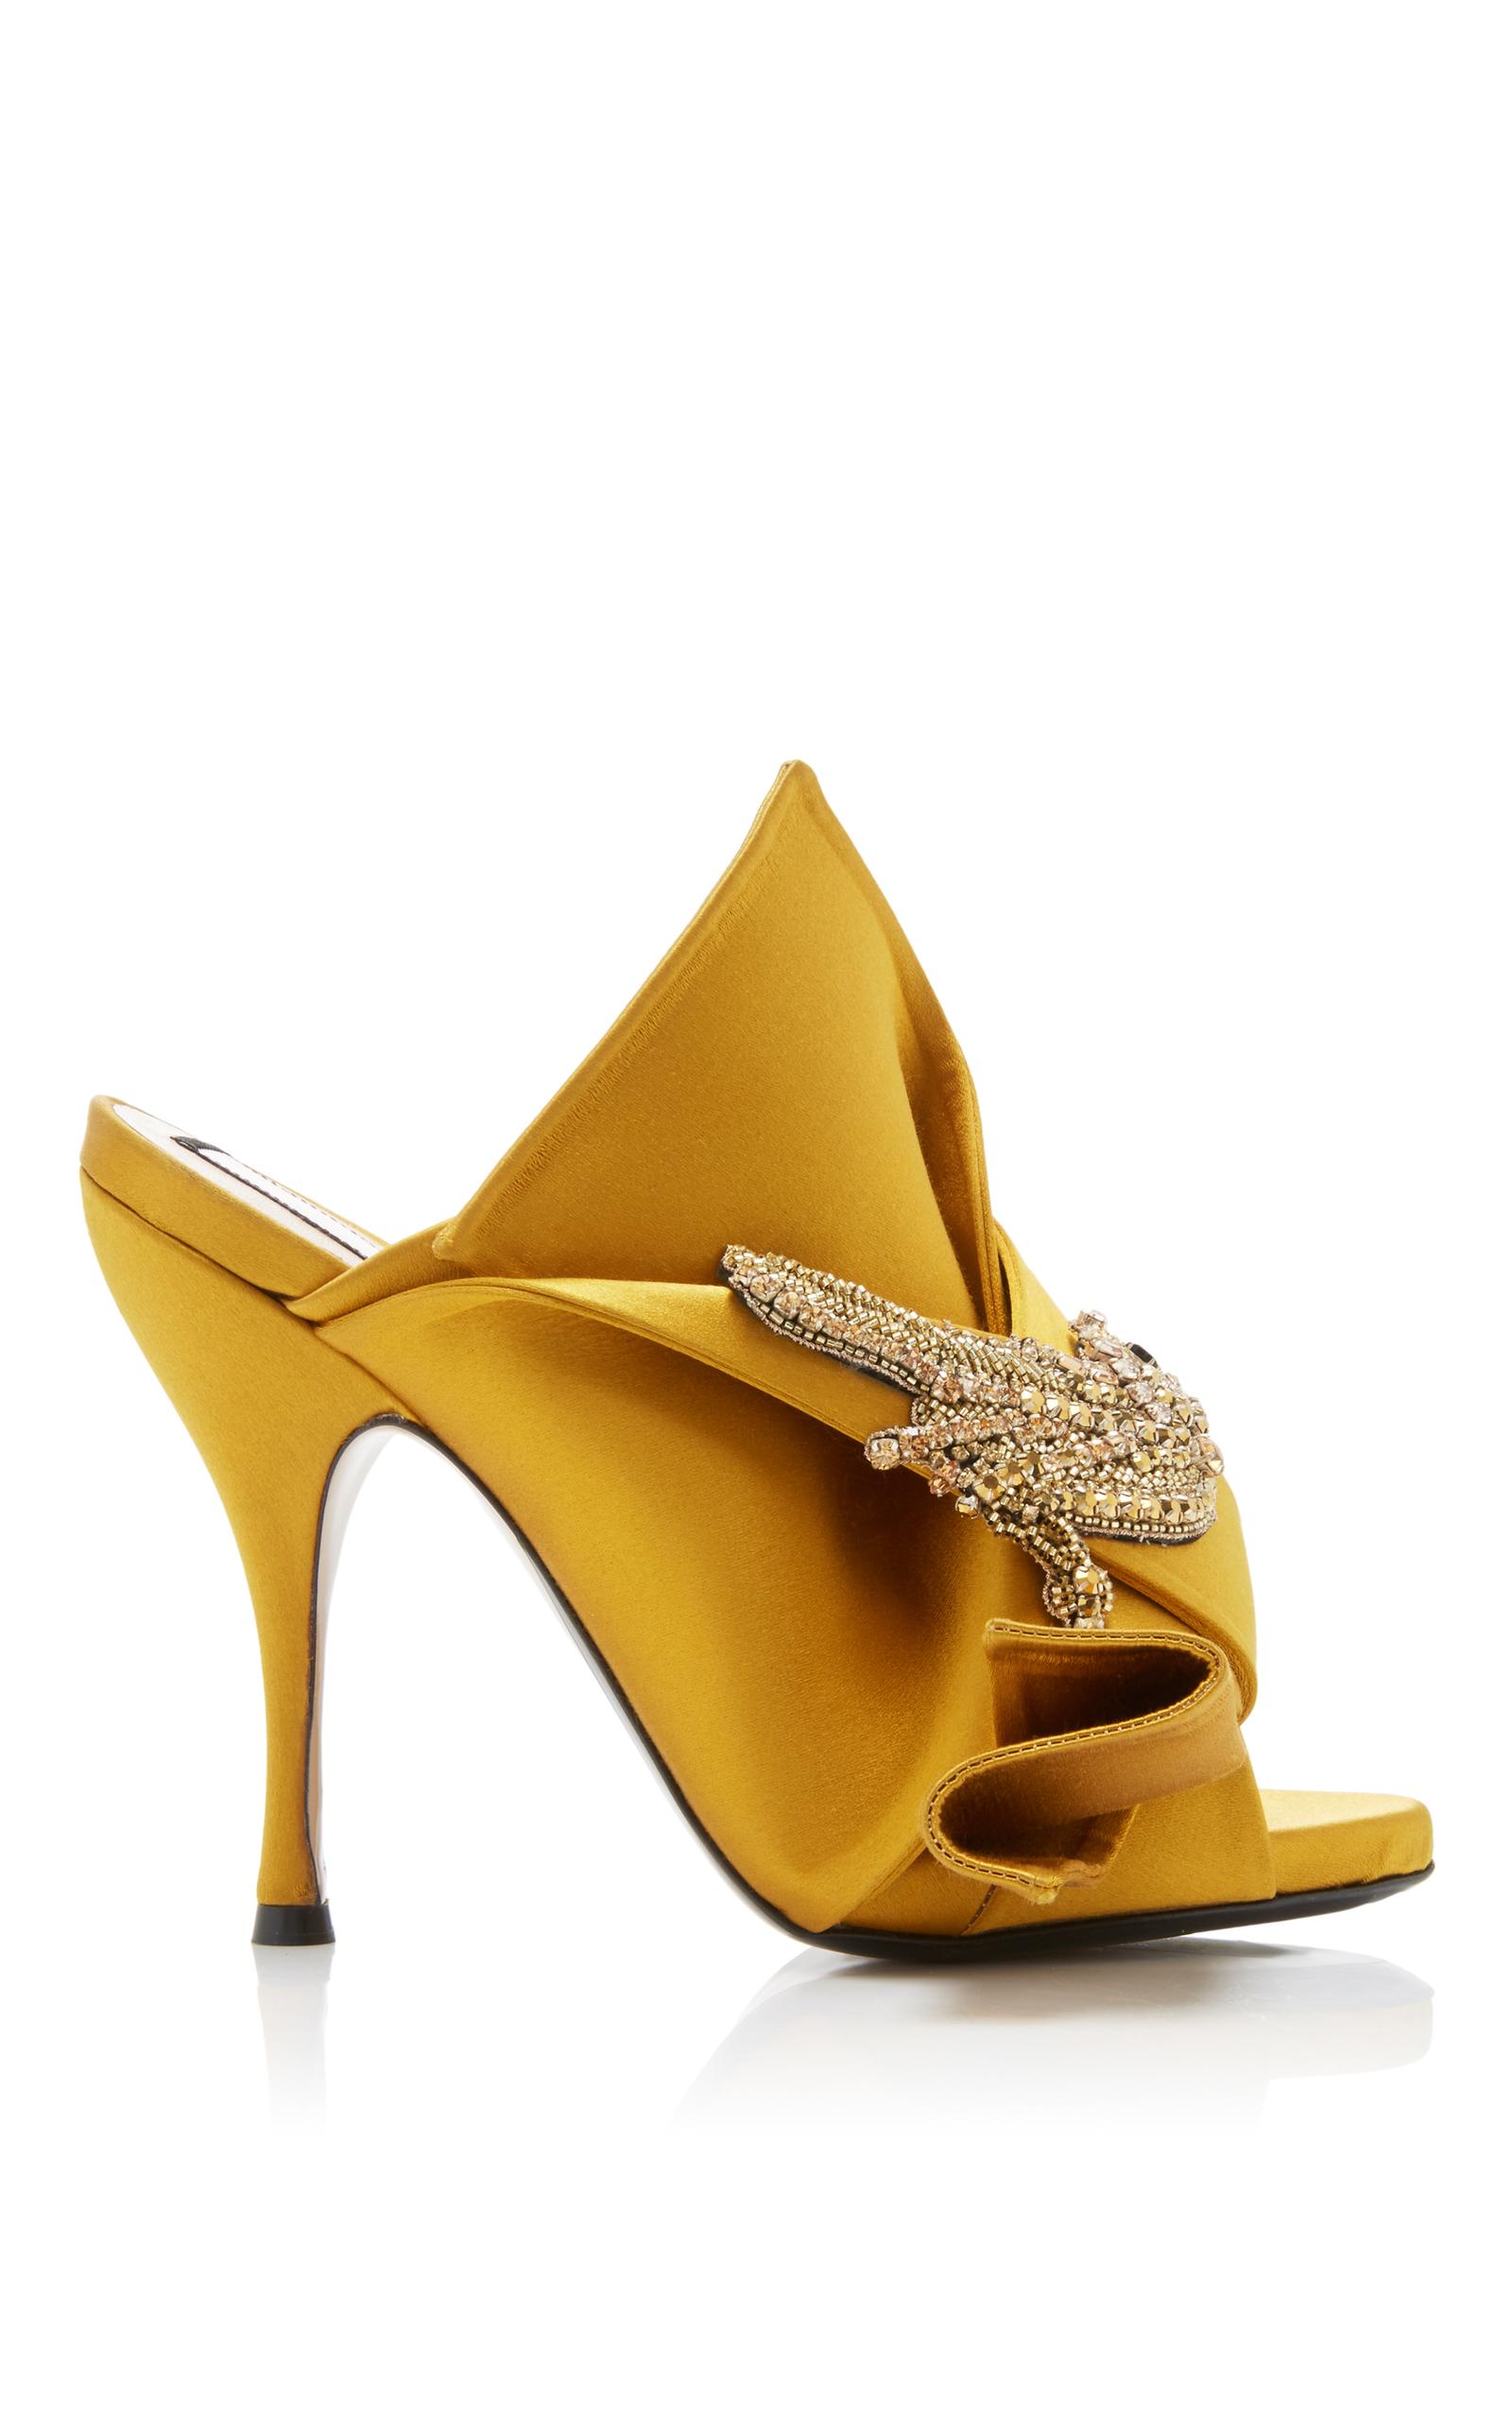 knot detail mules - Yellow & Orange N cNTyaQ